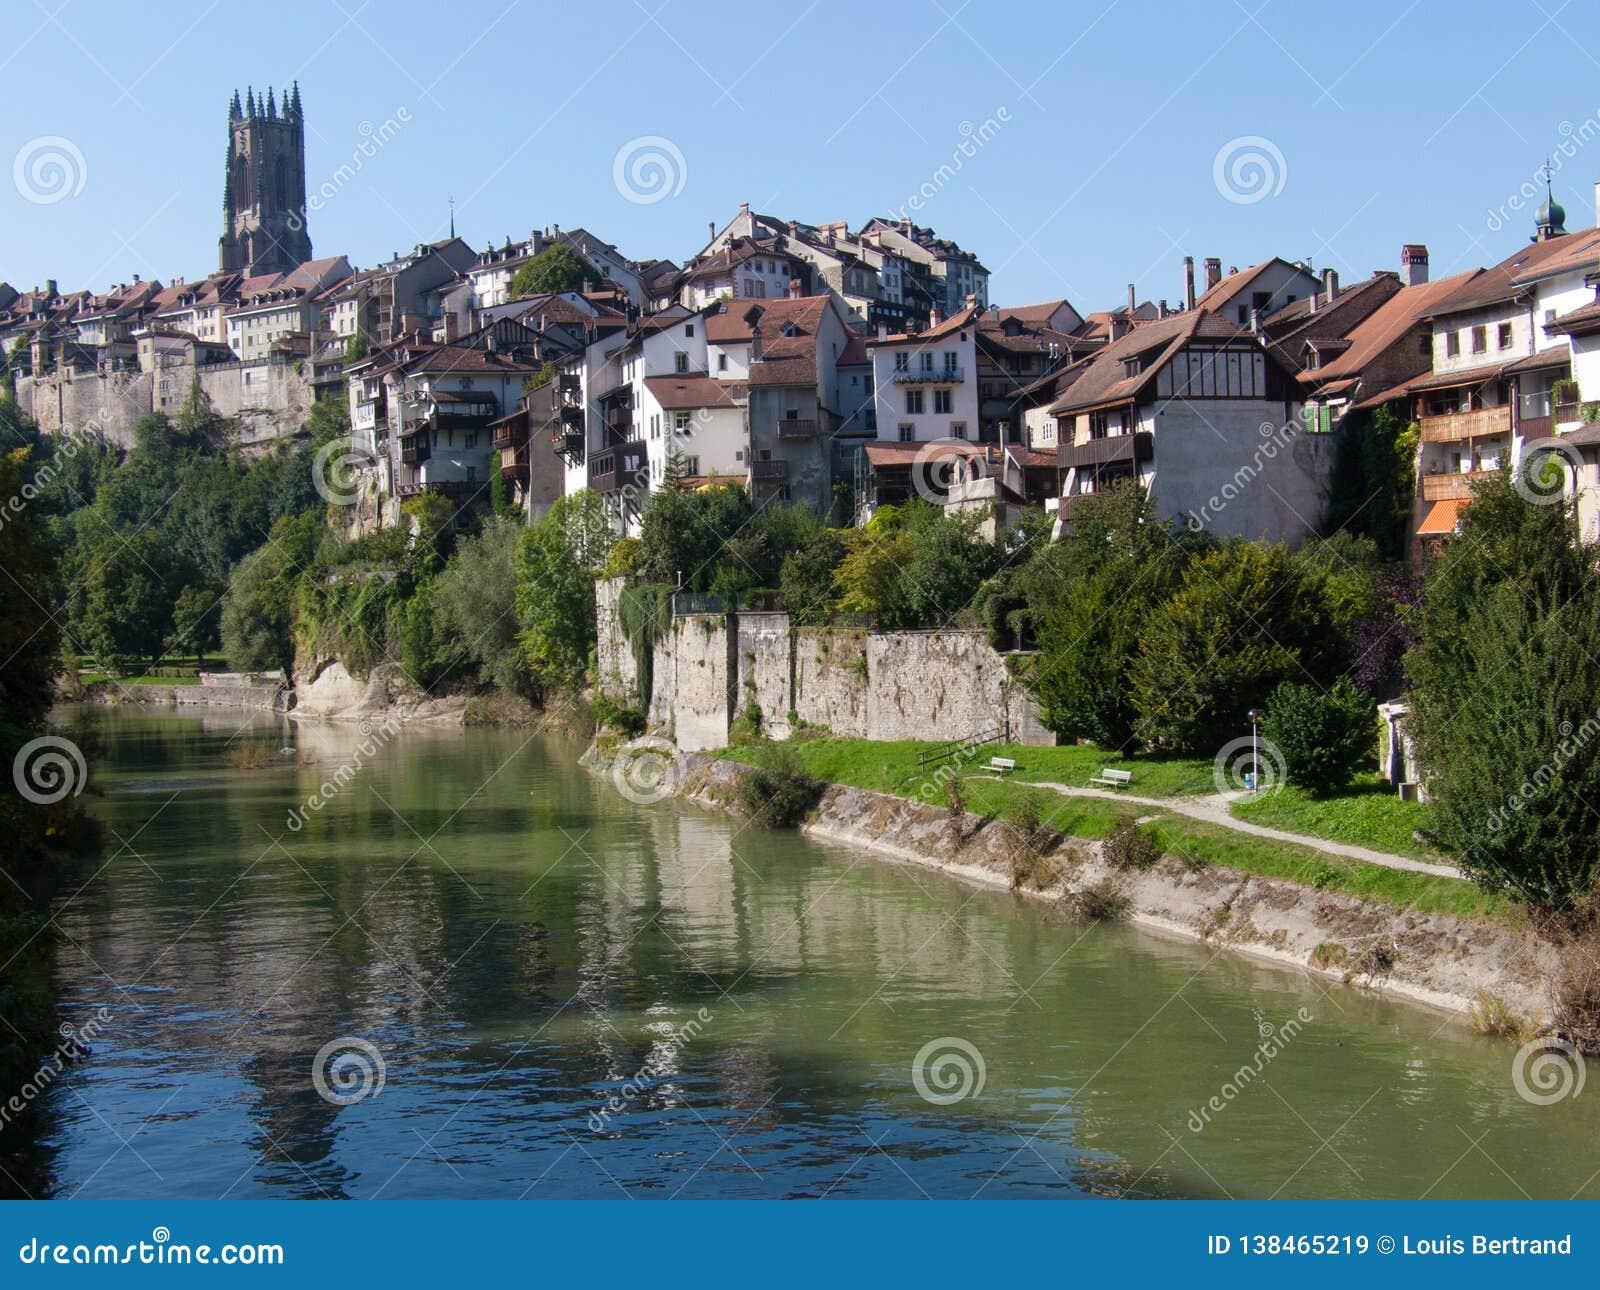 City Of Friborg Canton In Switzerland Stock Image - Image of ...